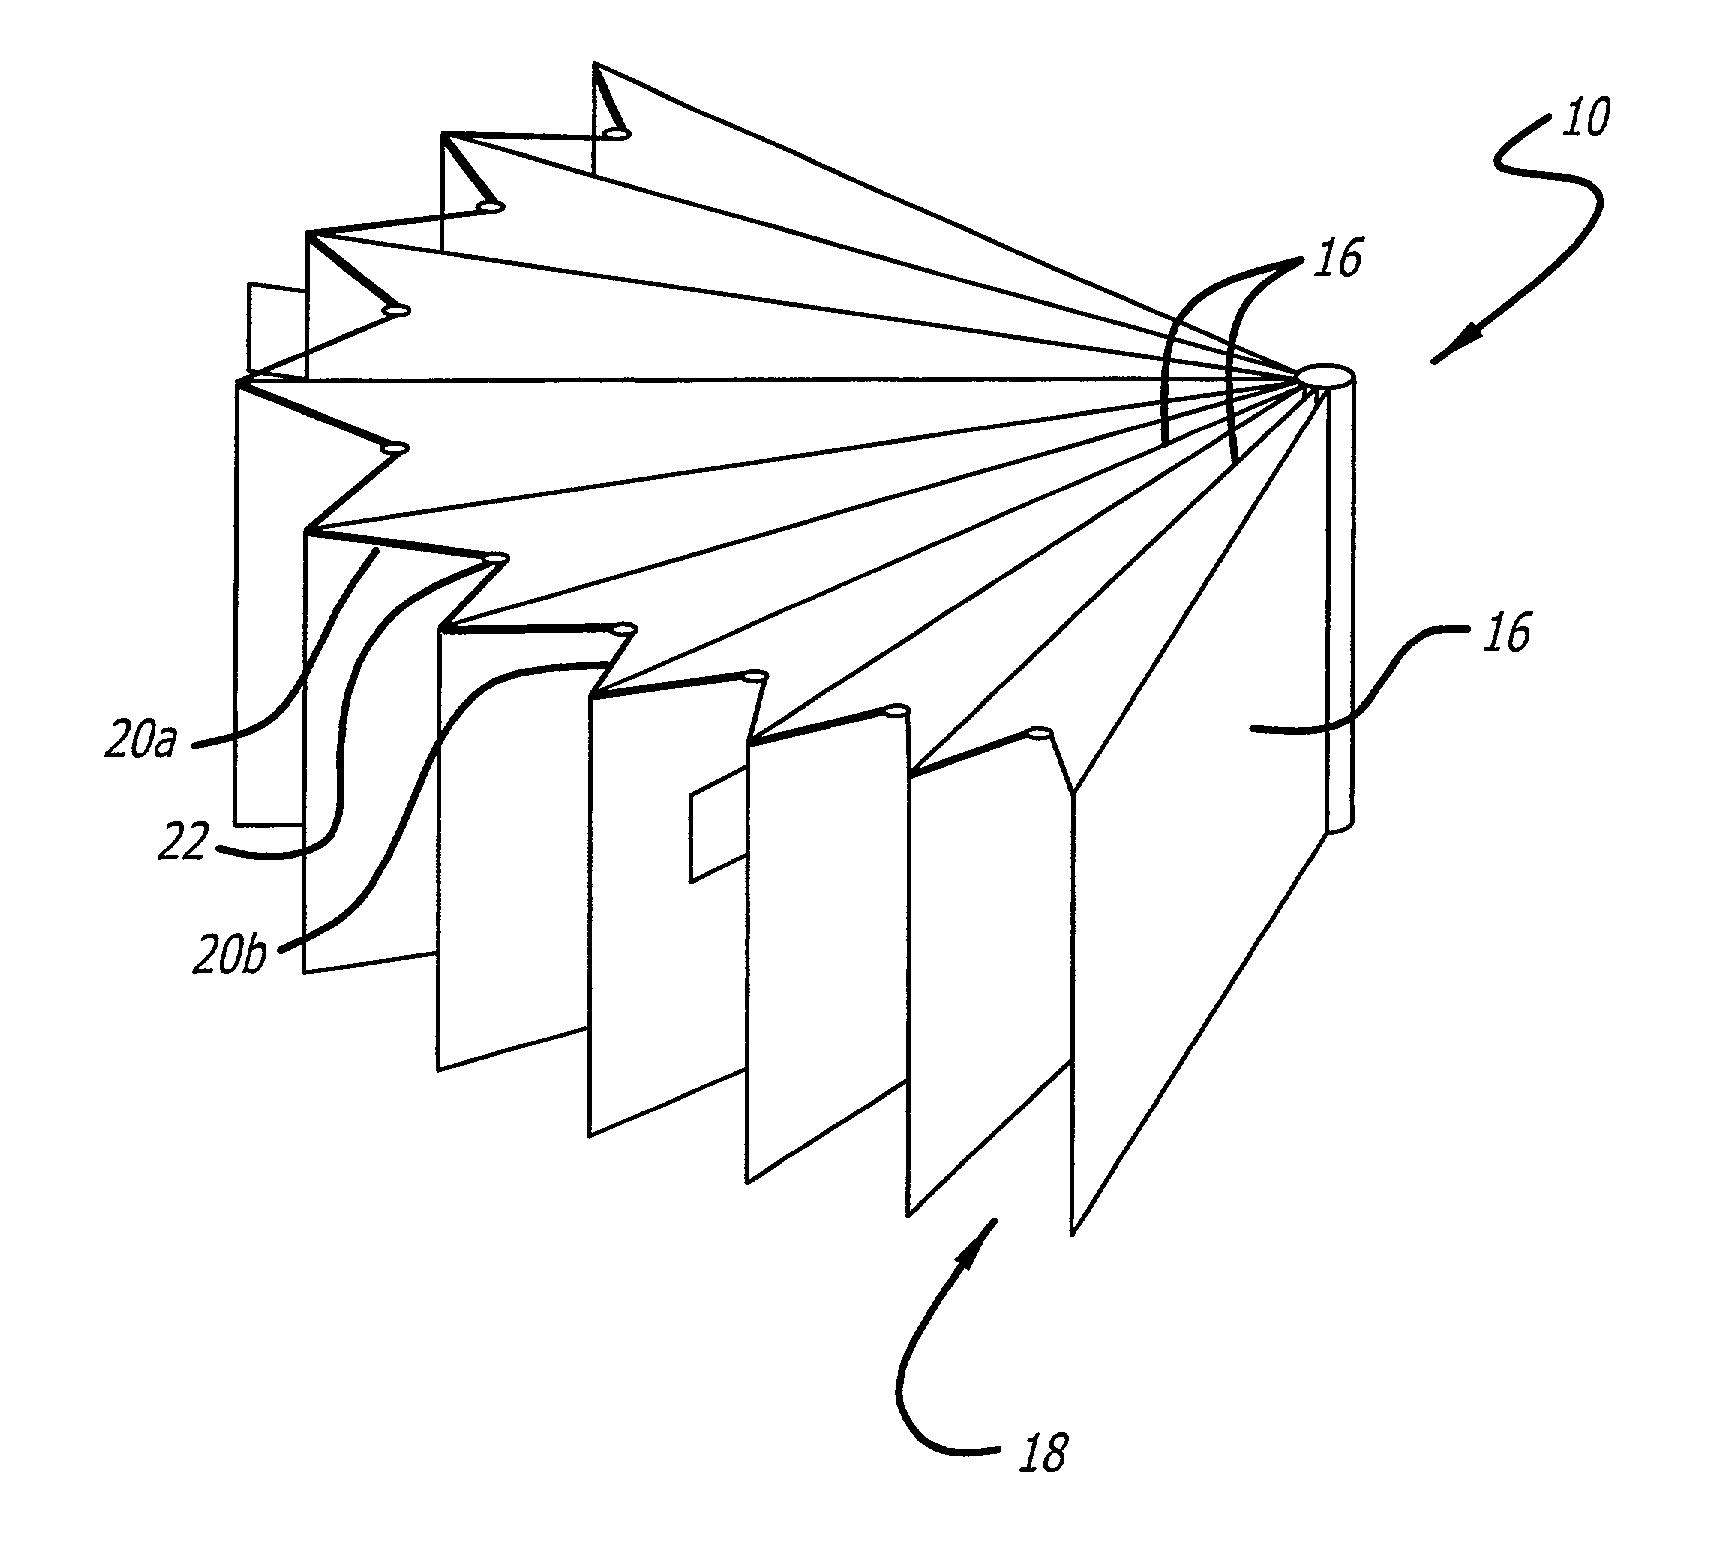 US Patent Pie Cutter